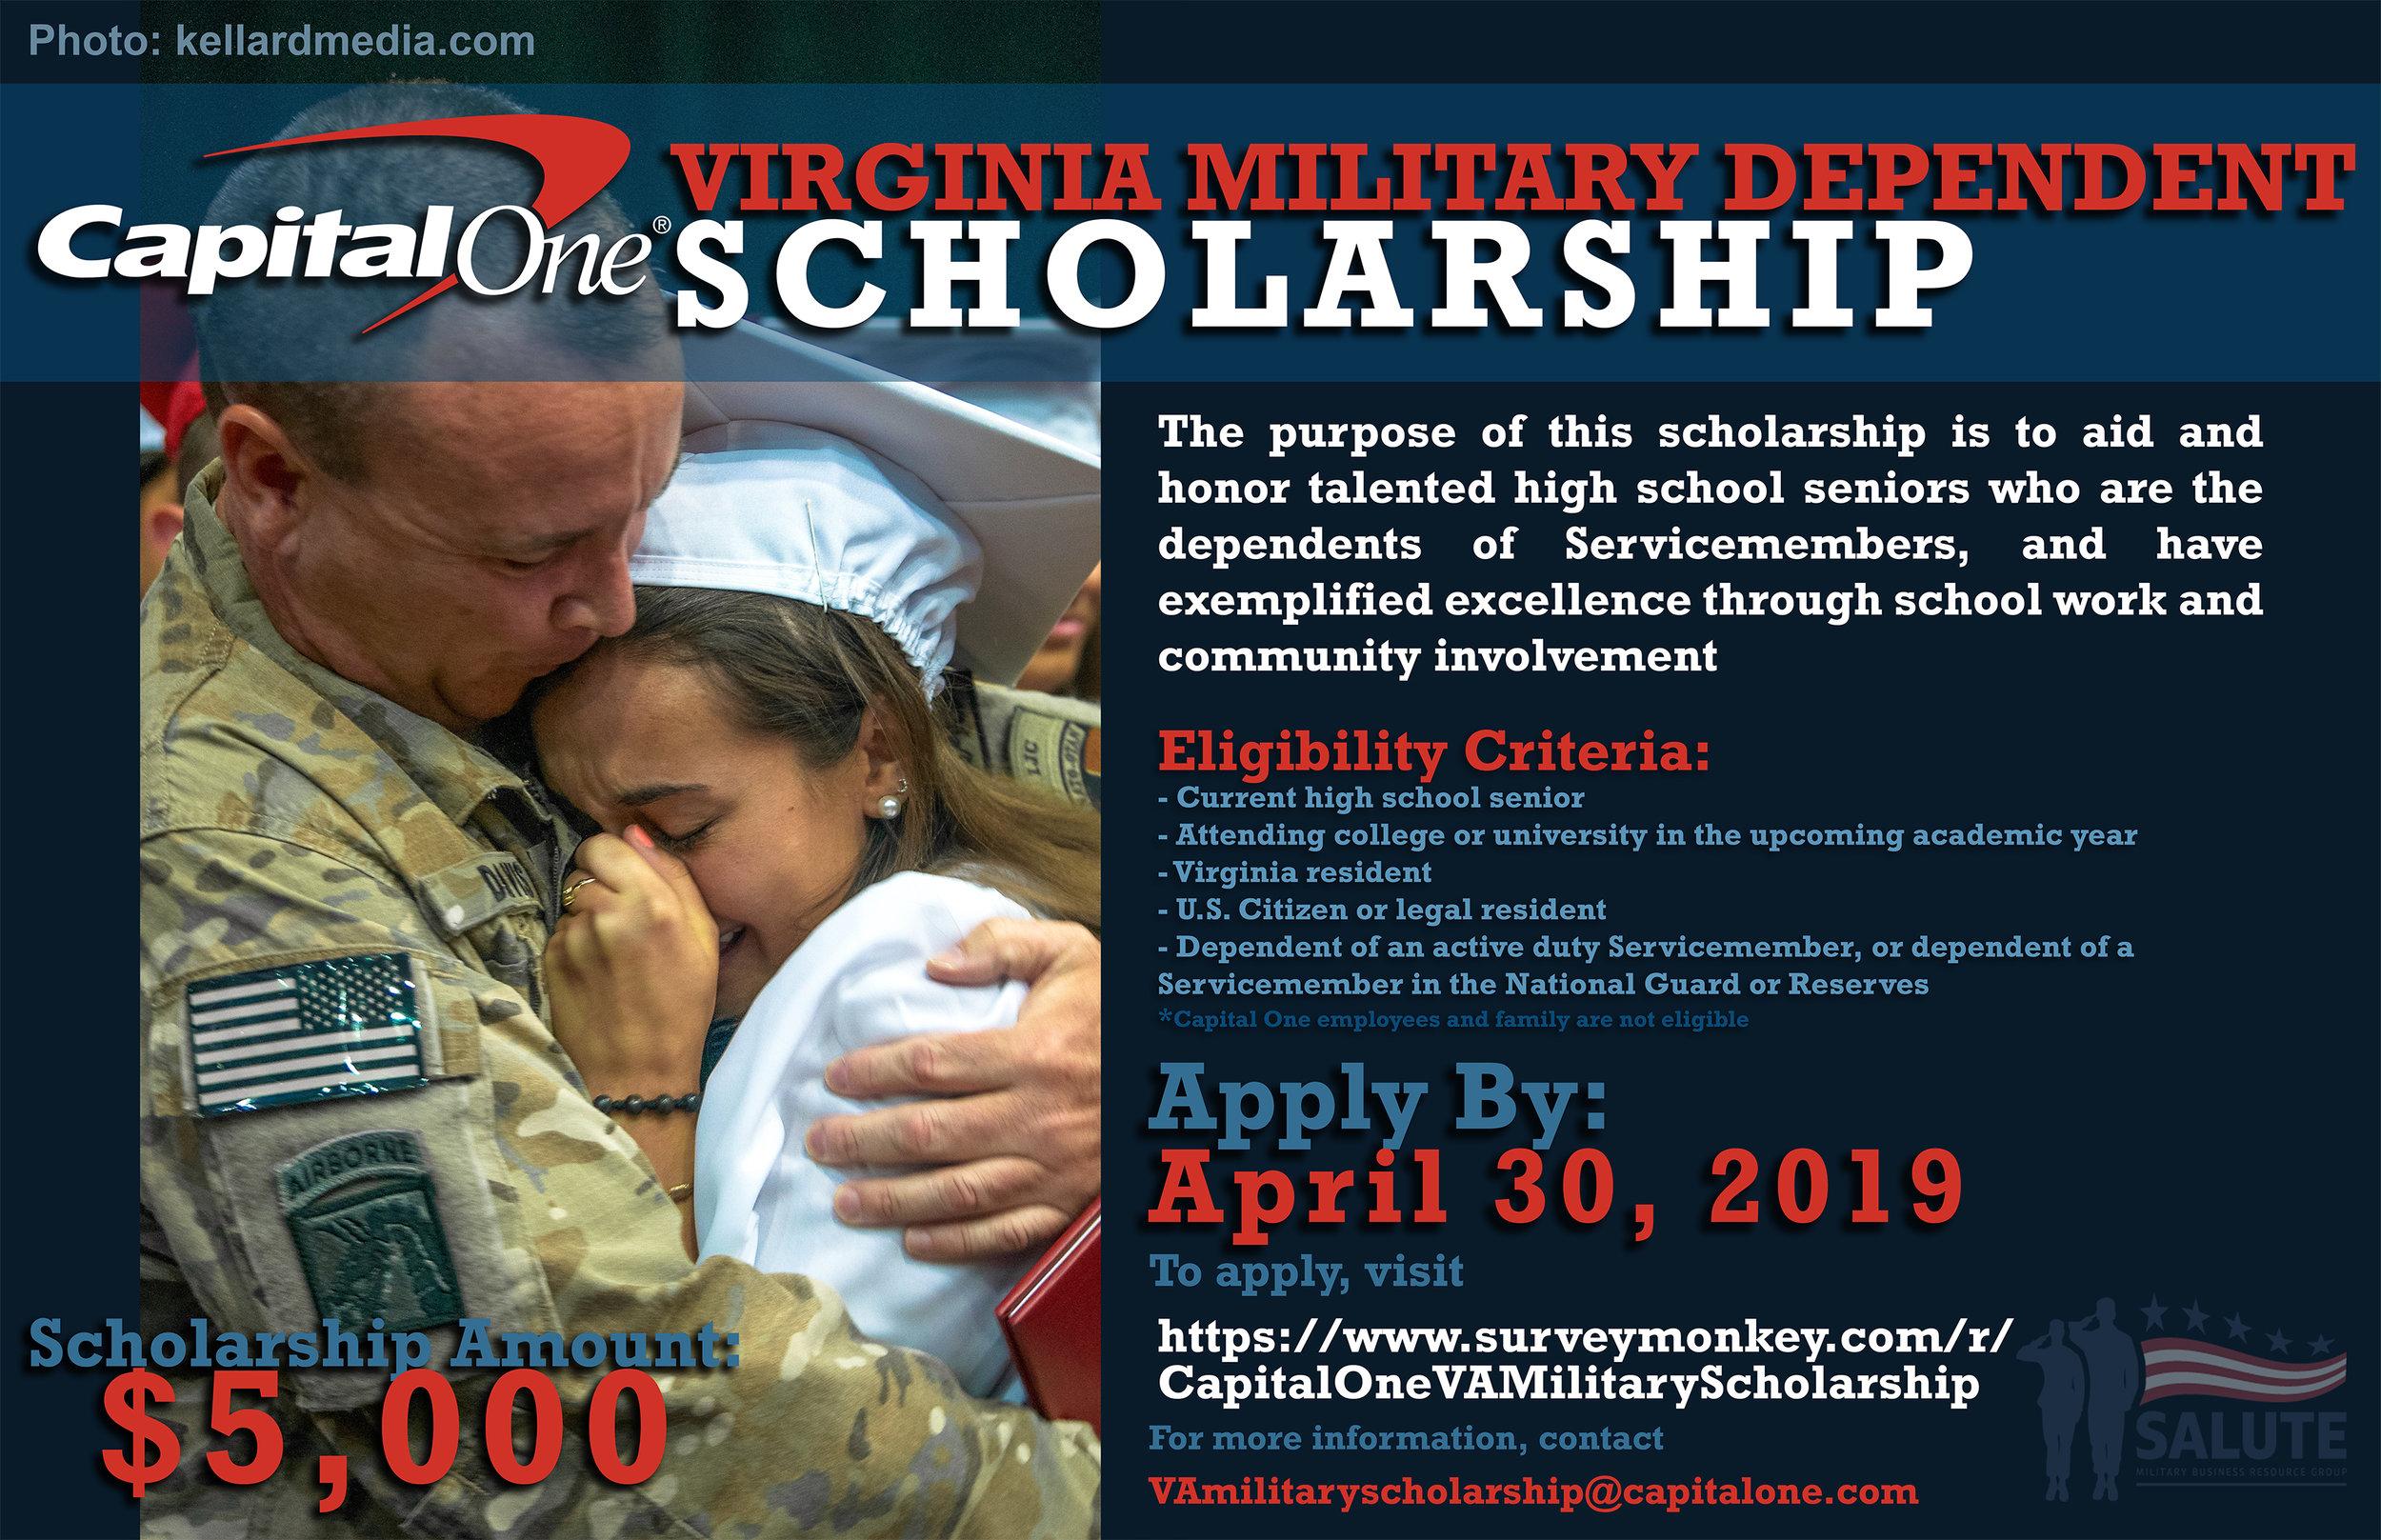 Capital One Scholarship Flyer.jpg